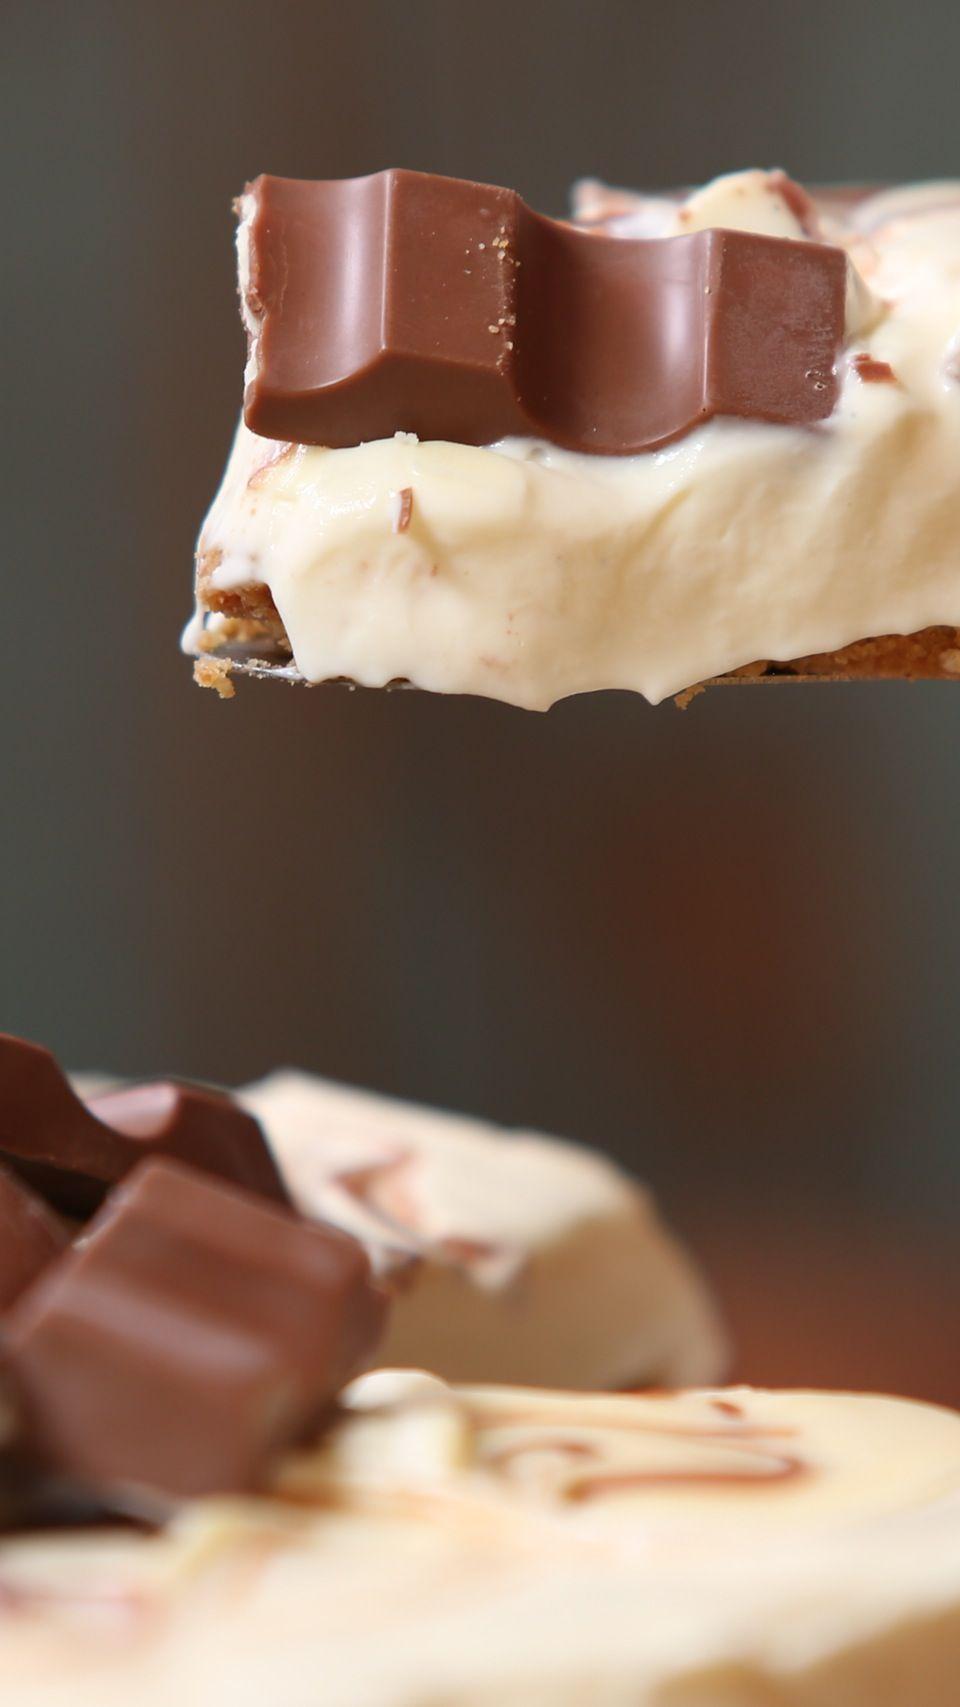 Kinder Cheesecake | Recipe in 2020 | Cheesecake recipes ...